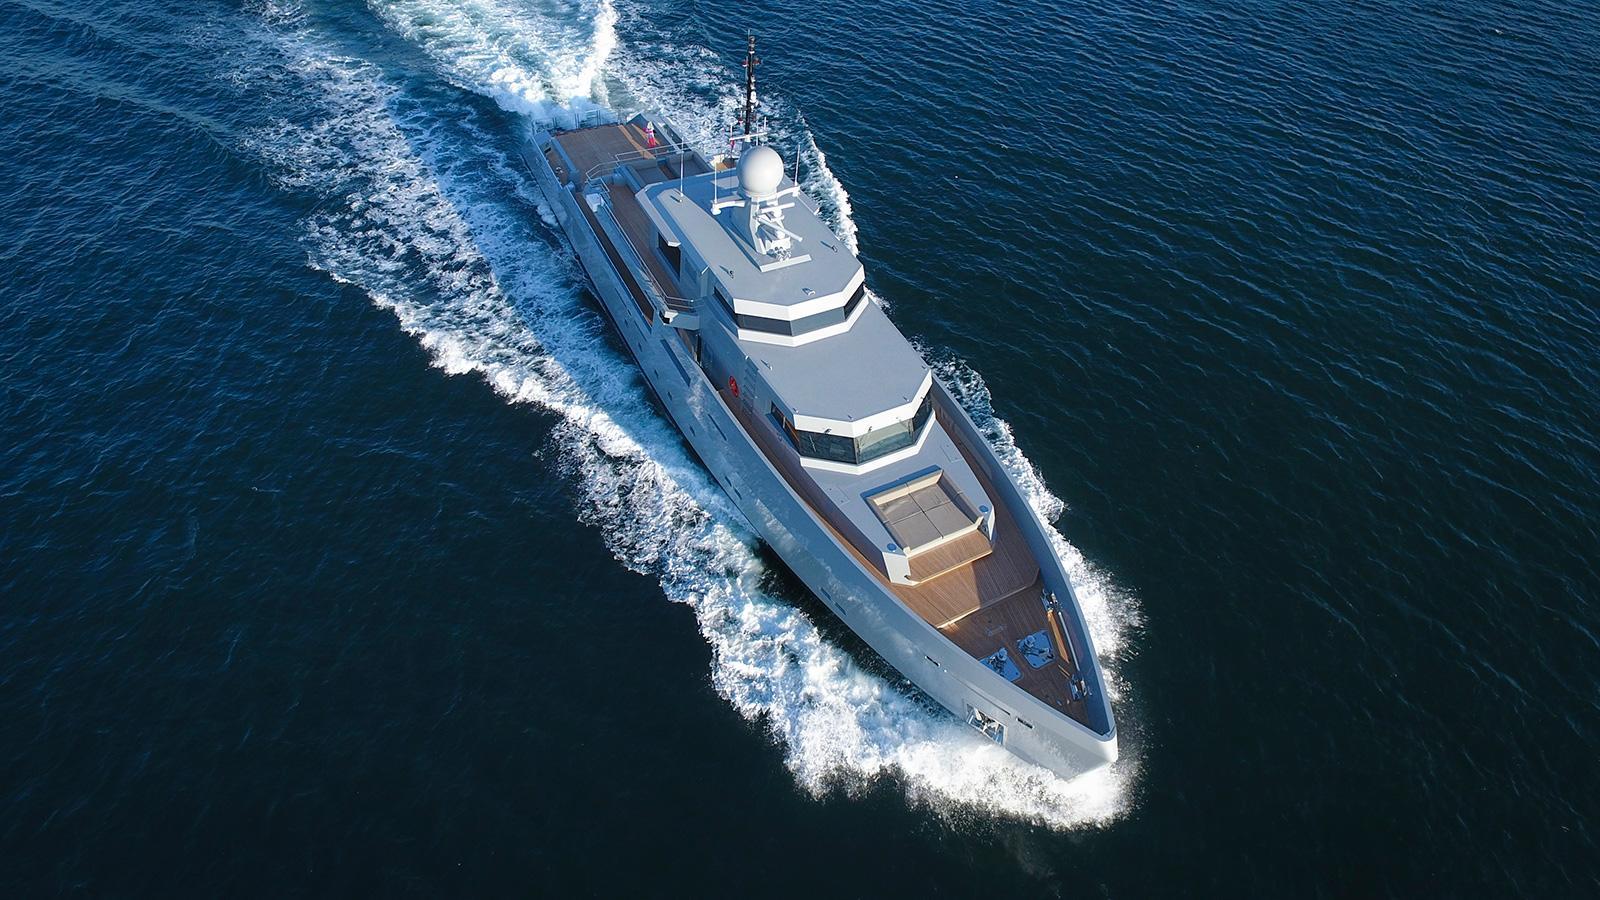 cyclone motoryacht tansu yachts 44m 2017 aerial